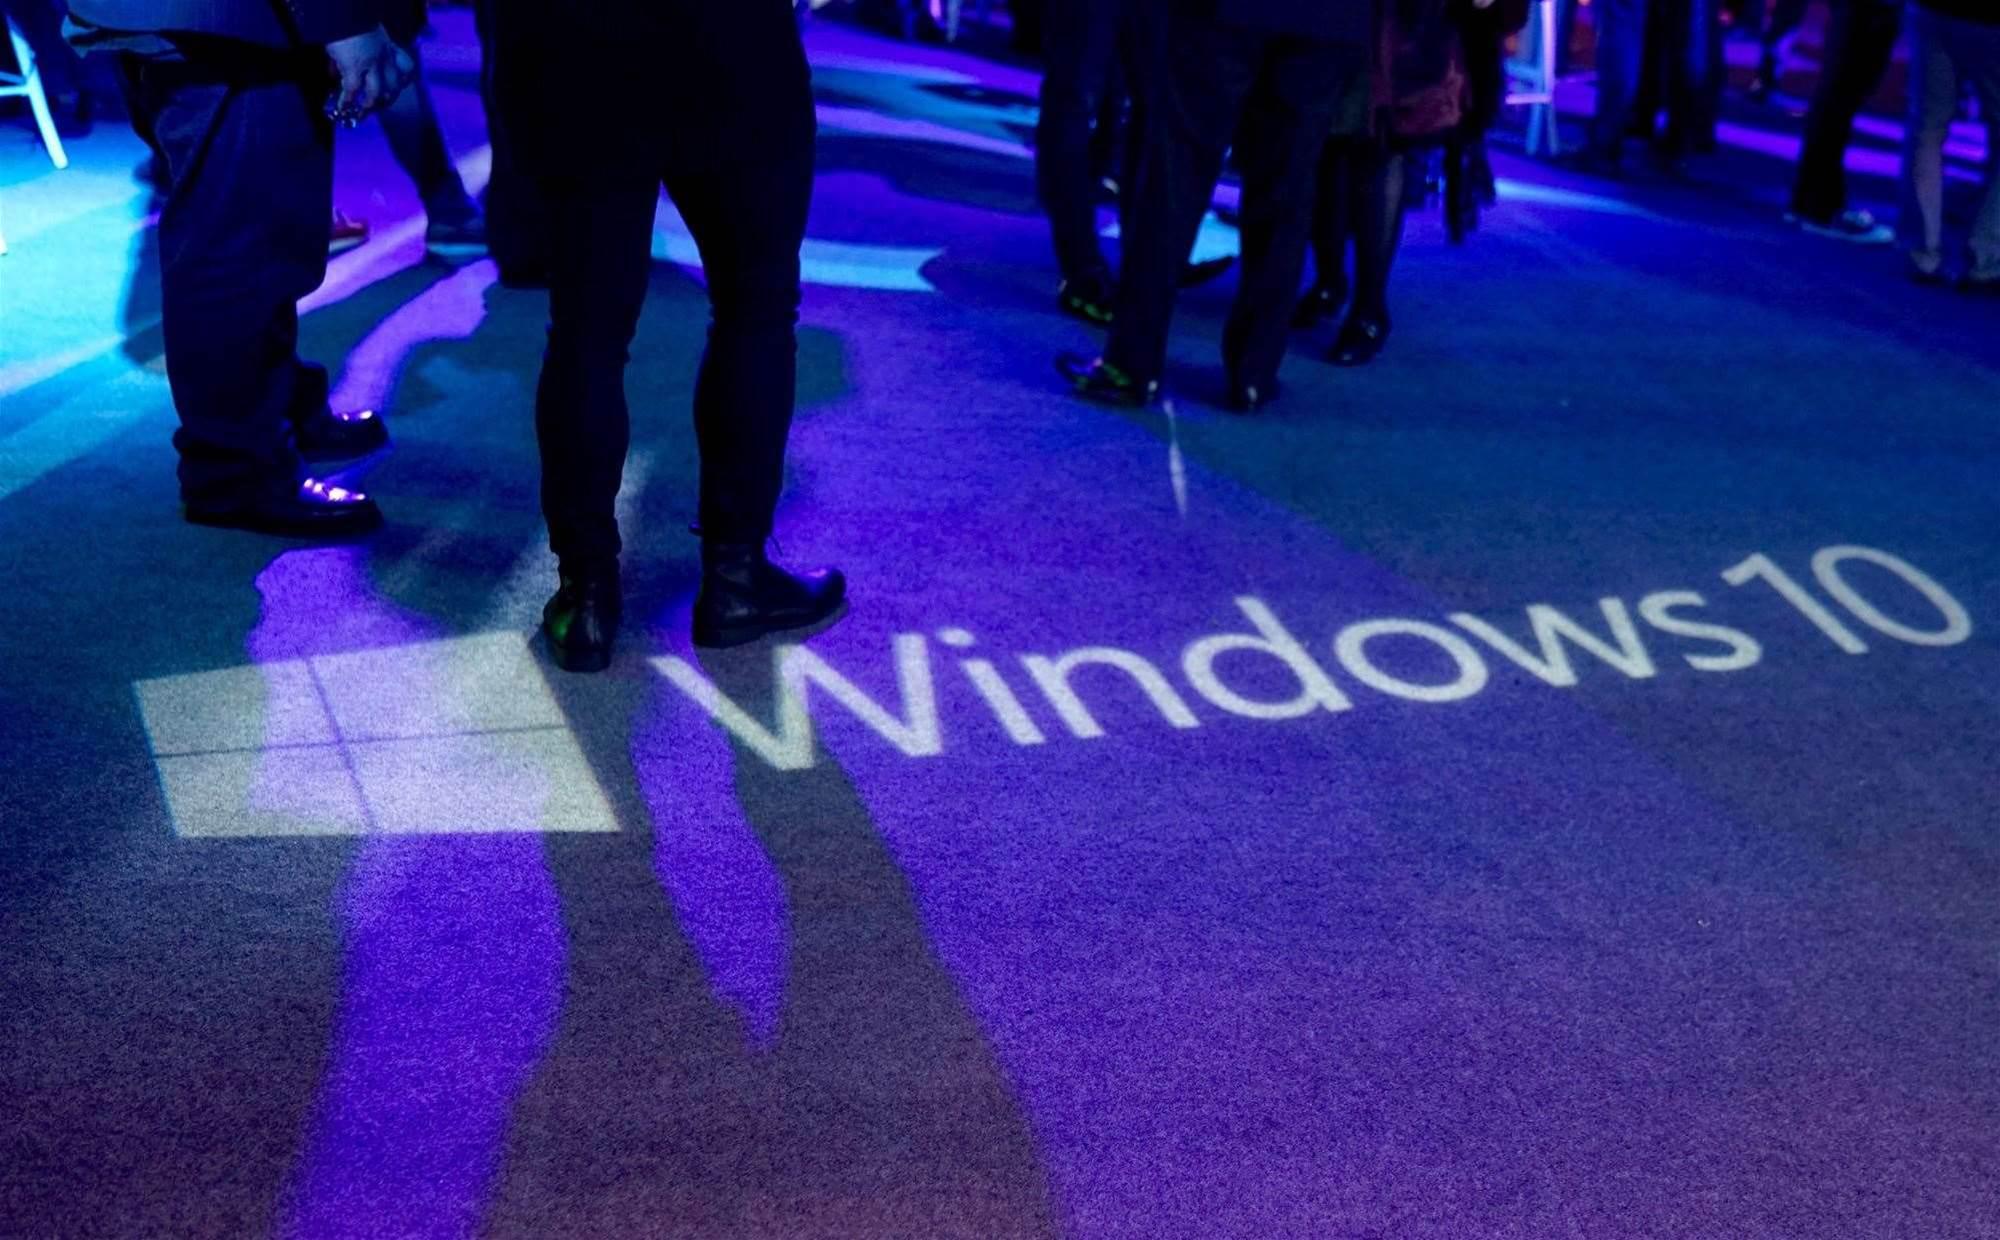 Windows 10 lands in Australia